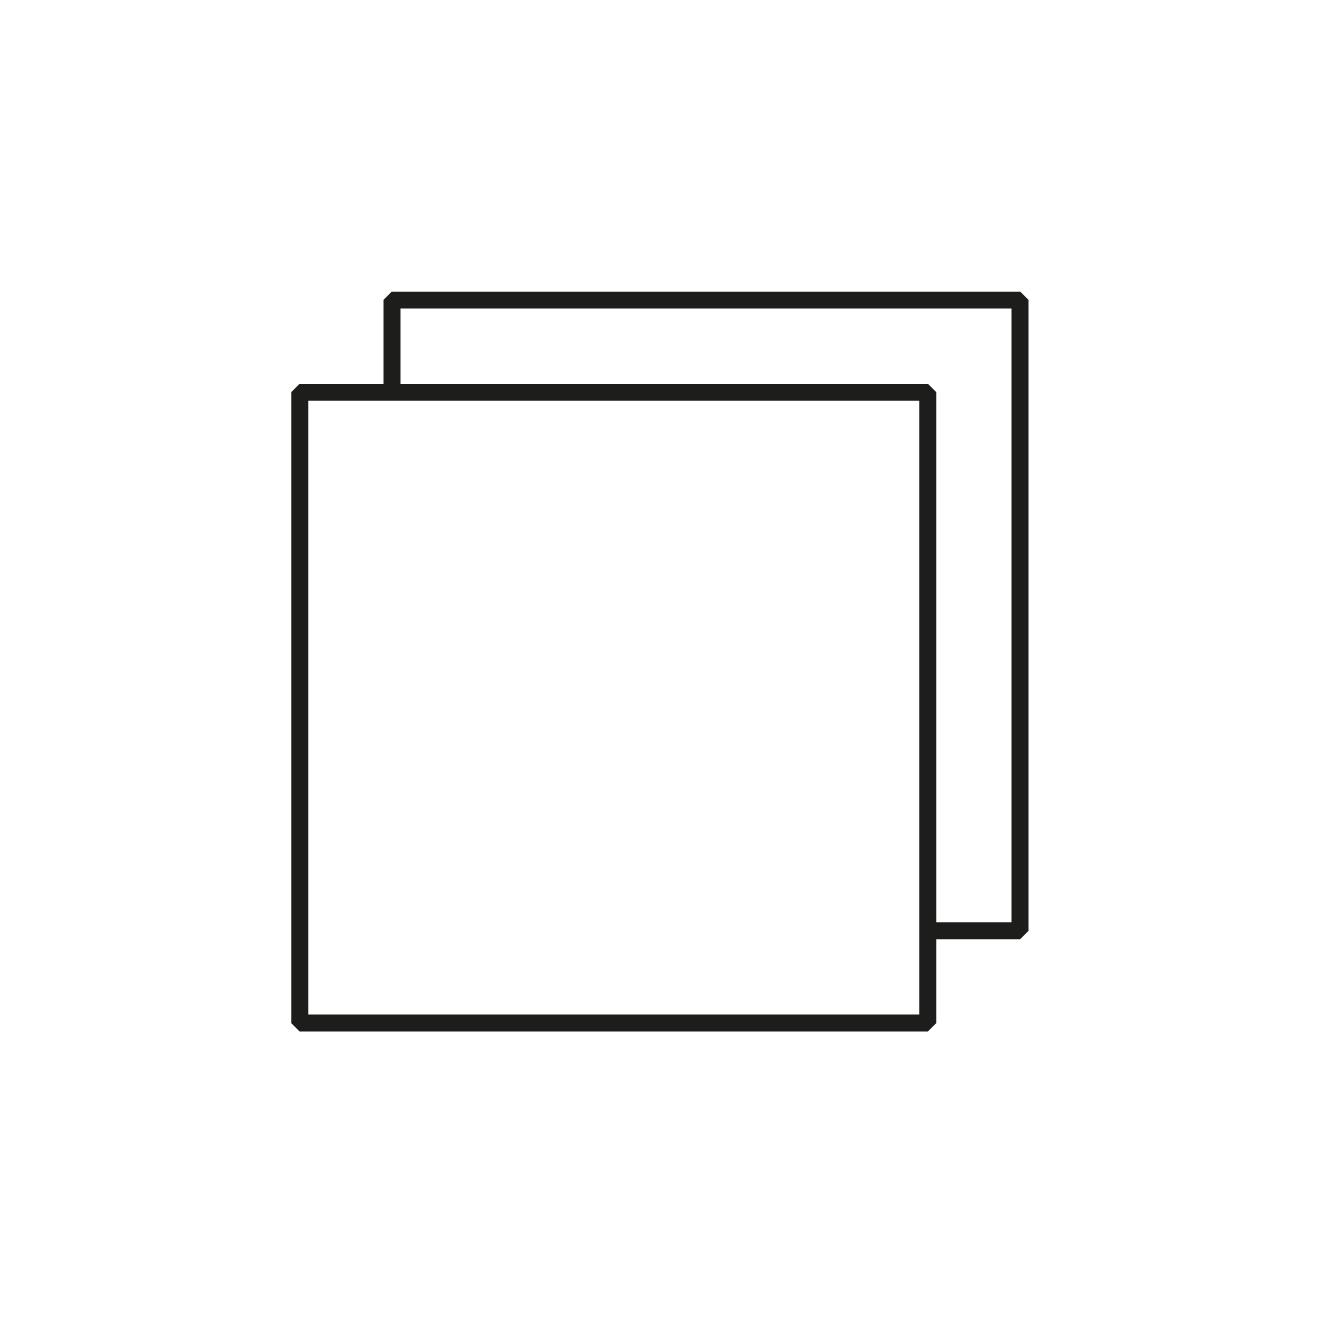 62d72e9b f8f4 4251 81fb 8fea8e56aa16?auto=format&fit=crop&h=570&w=430